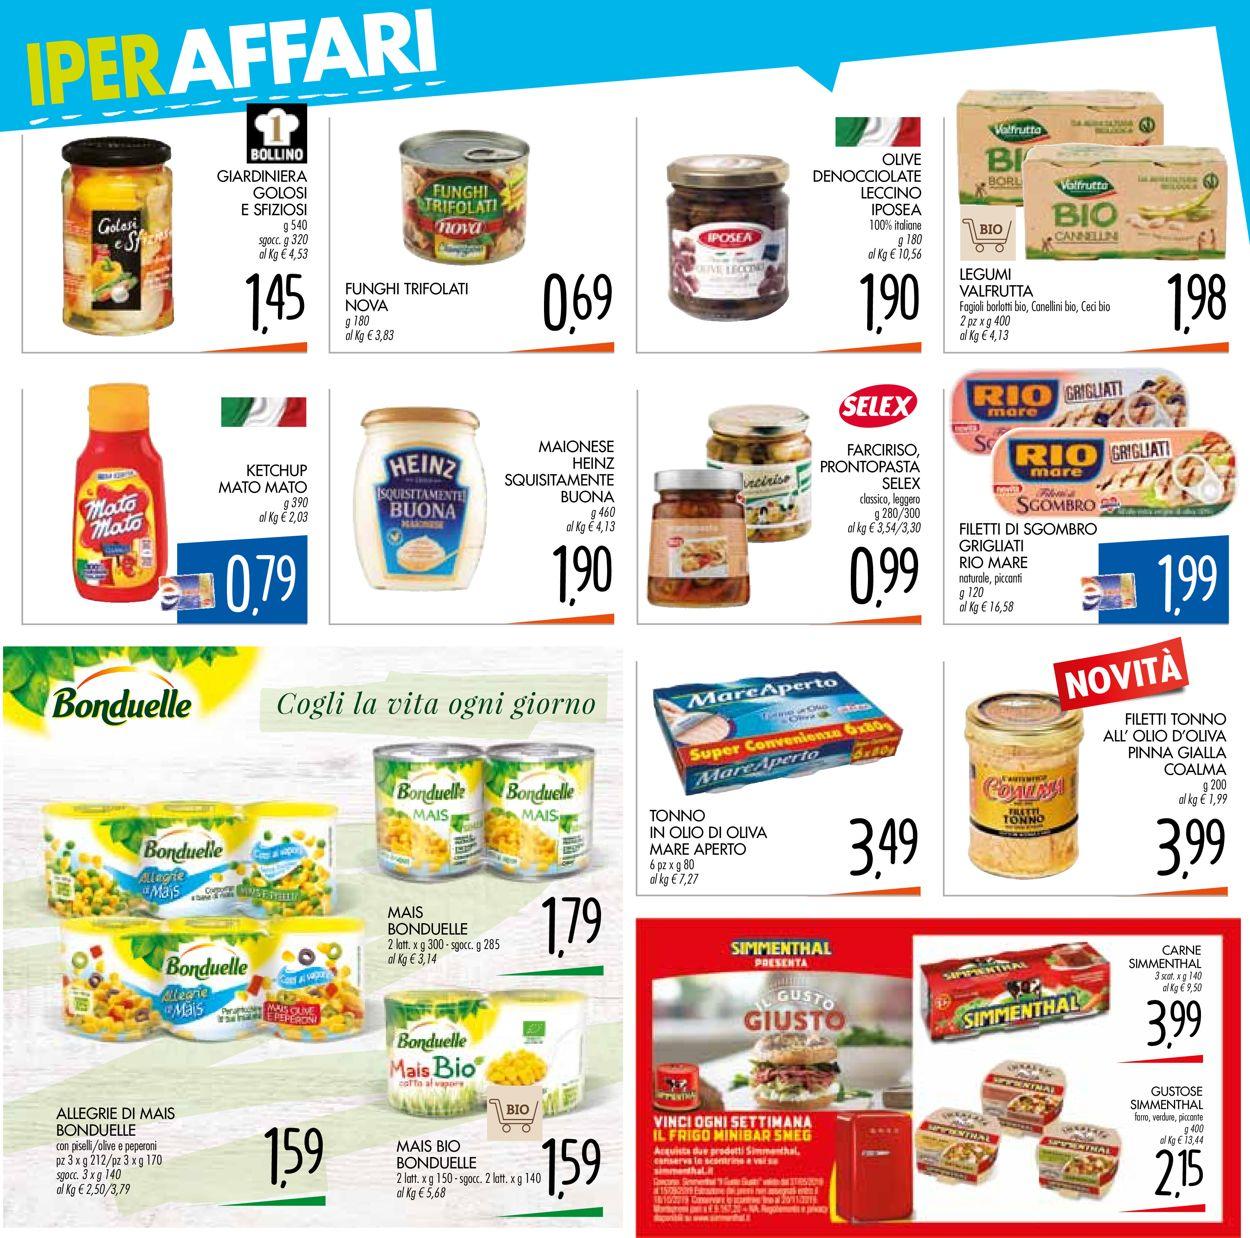 Volantino Emisfero - Offerte 18/07-31/07/2019 (Pagina 2)